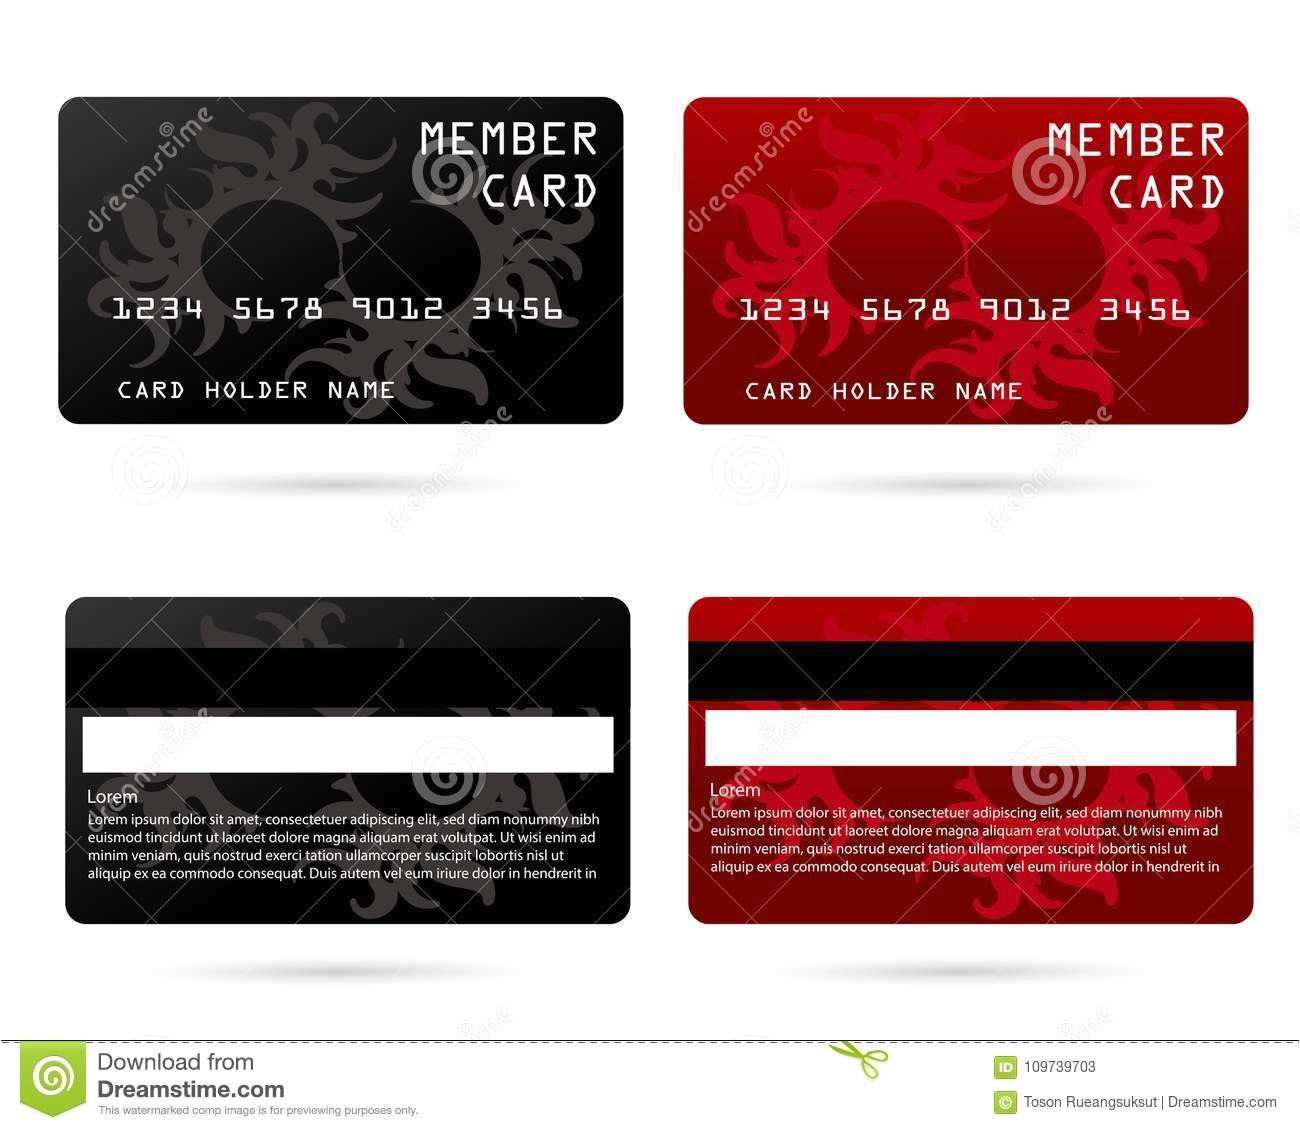 modern credit card business vip card design privilege member member card modern credit card business vip card member card 109739703 jpg